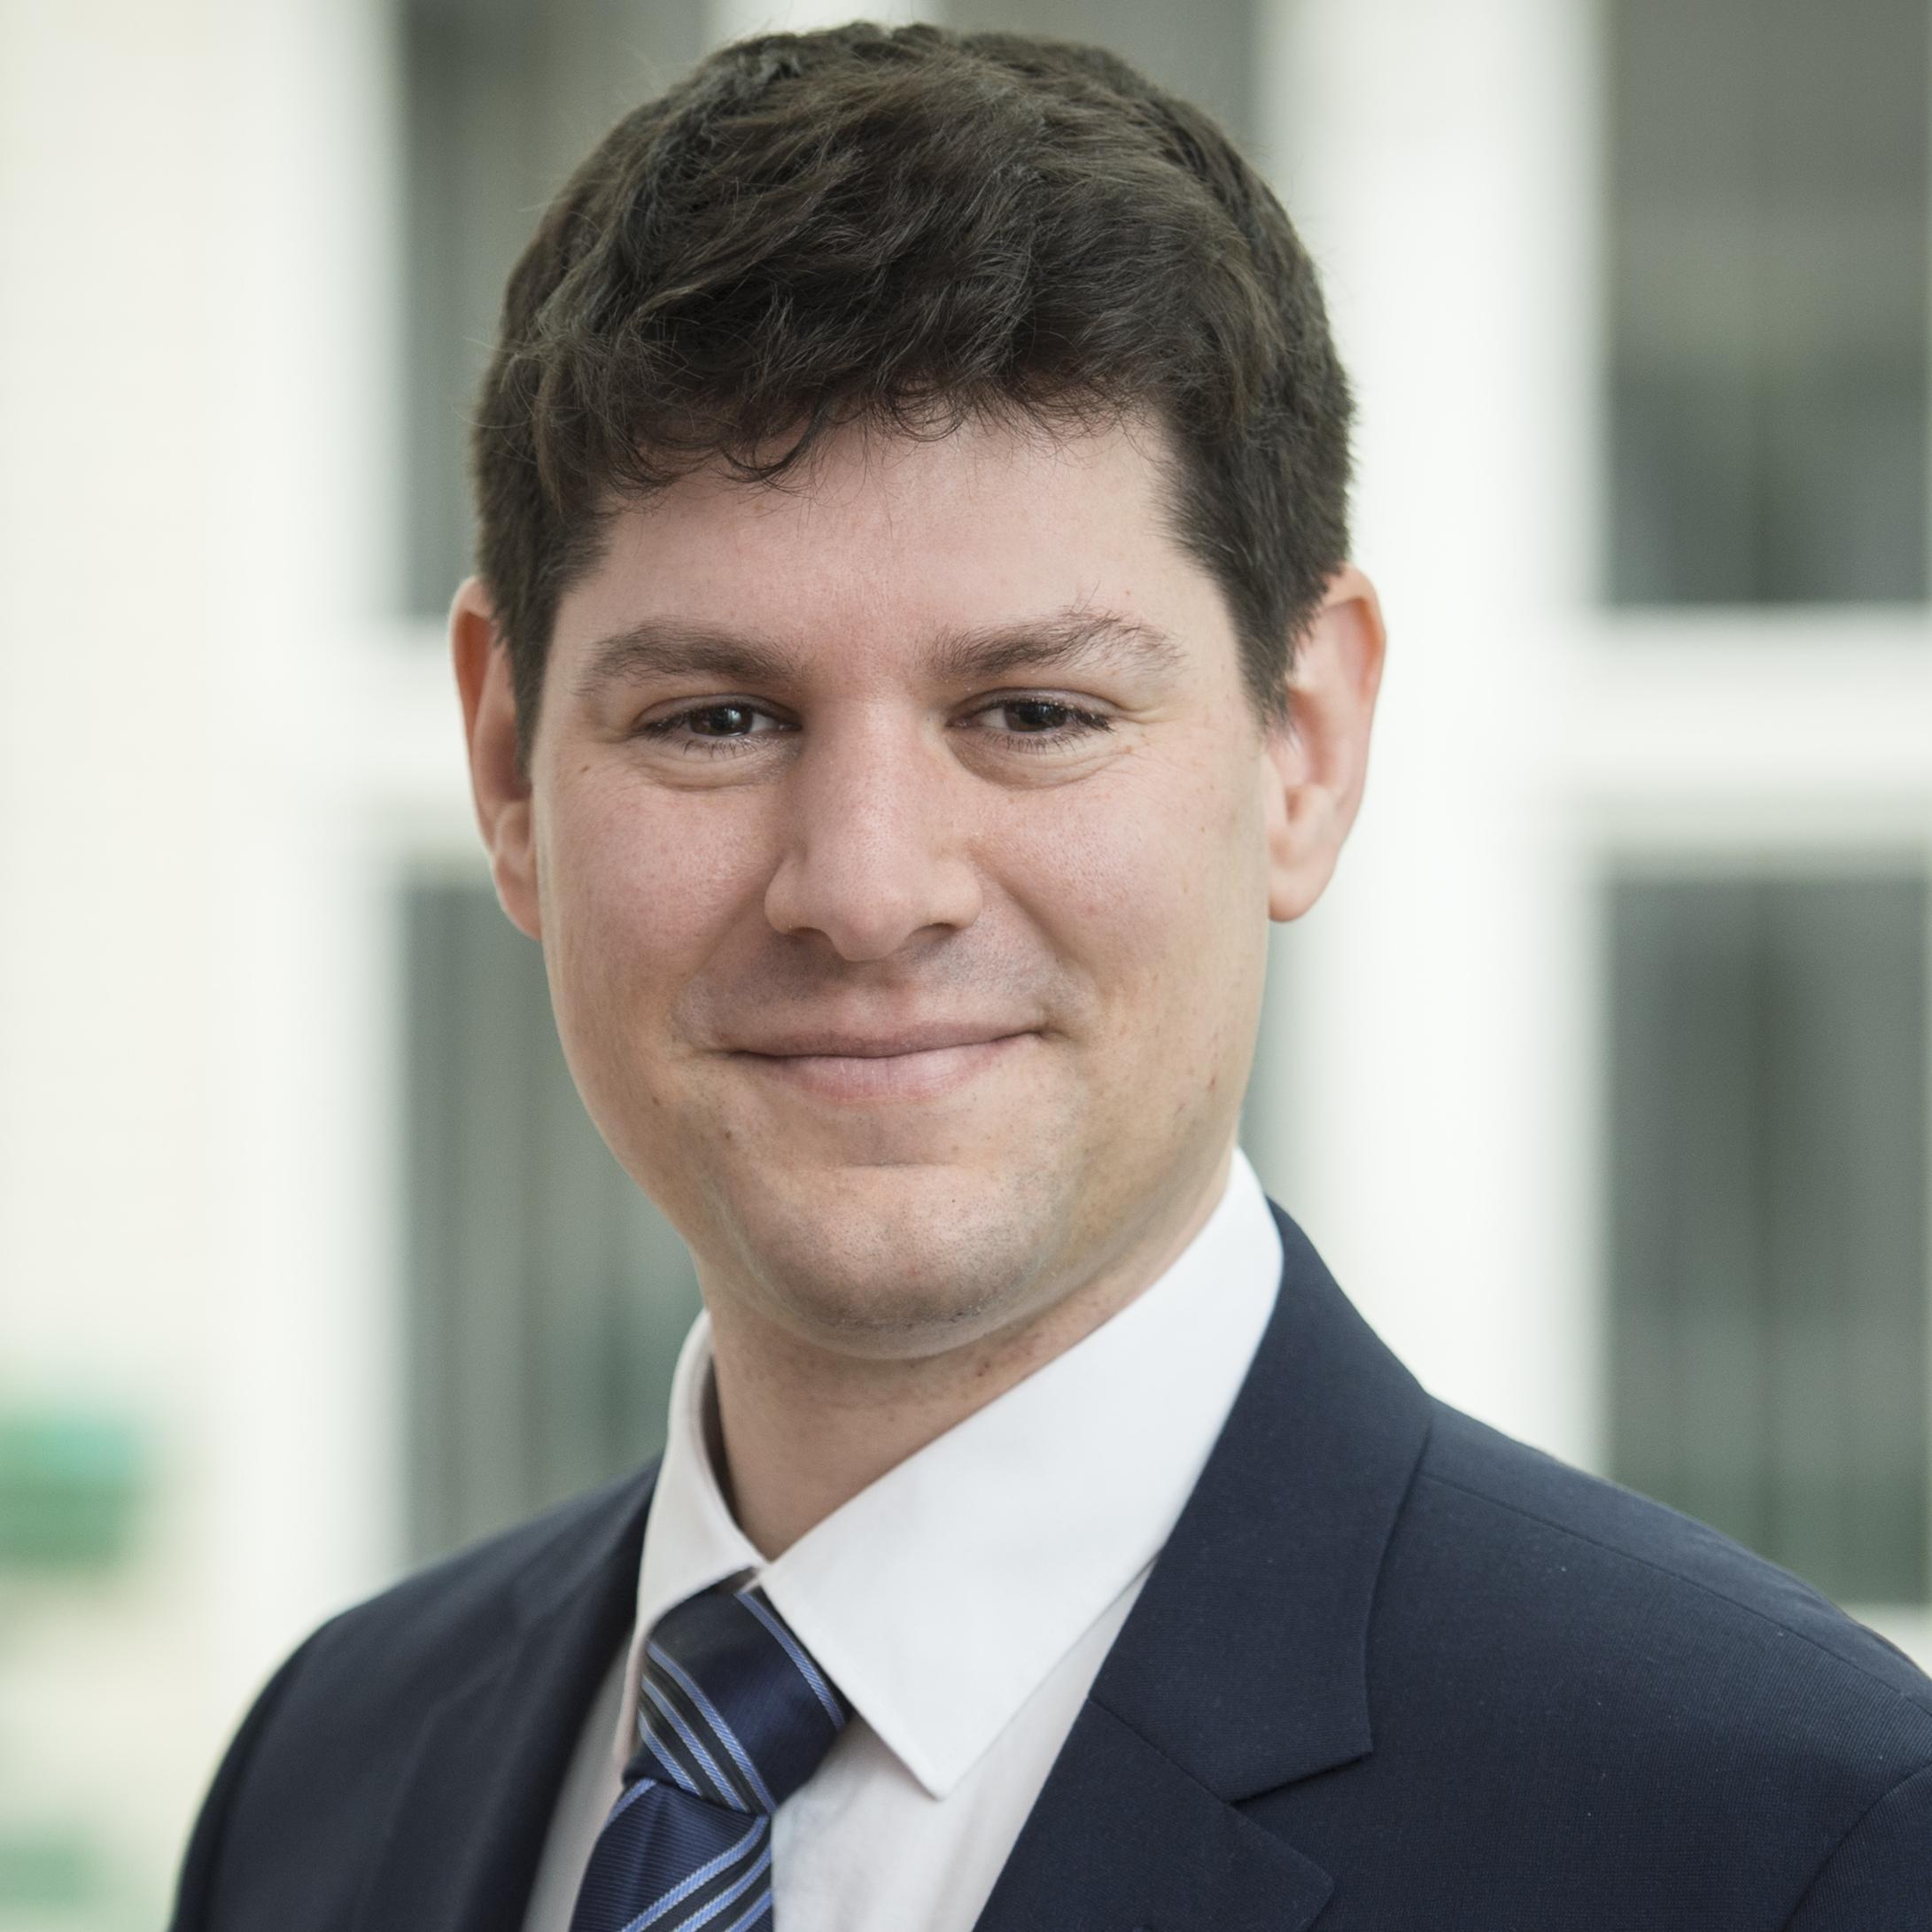 Matthias Stepan, Leiter des Programms Innenpolitik am Mercator Institut für China Studien (MERICS)